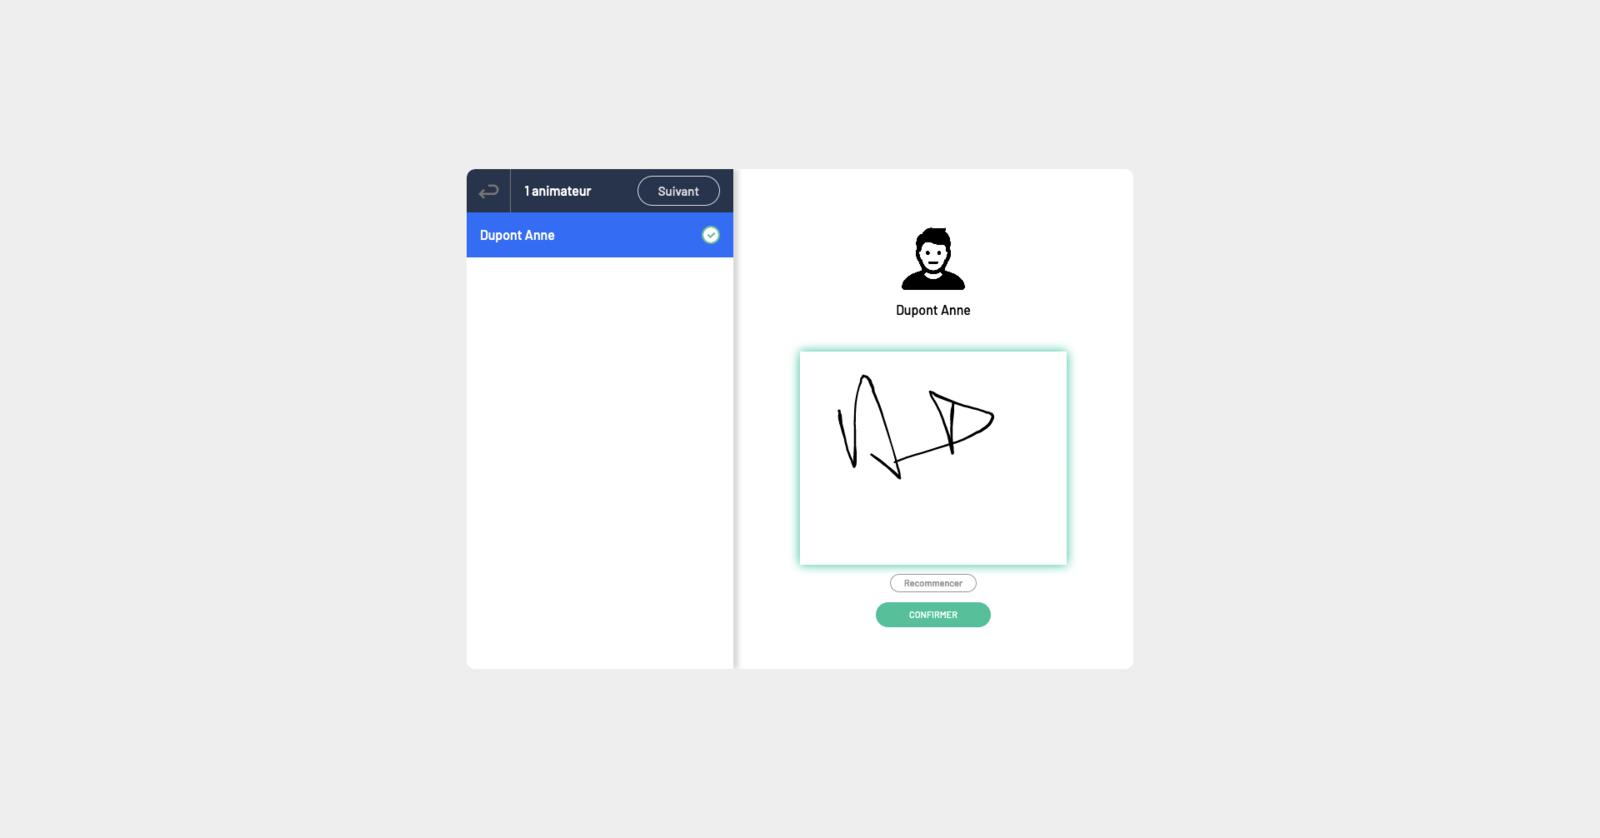 validation de signature